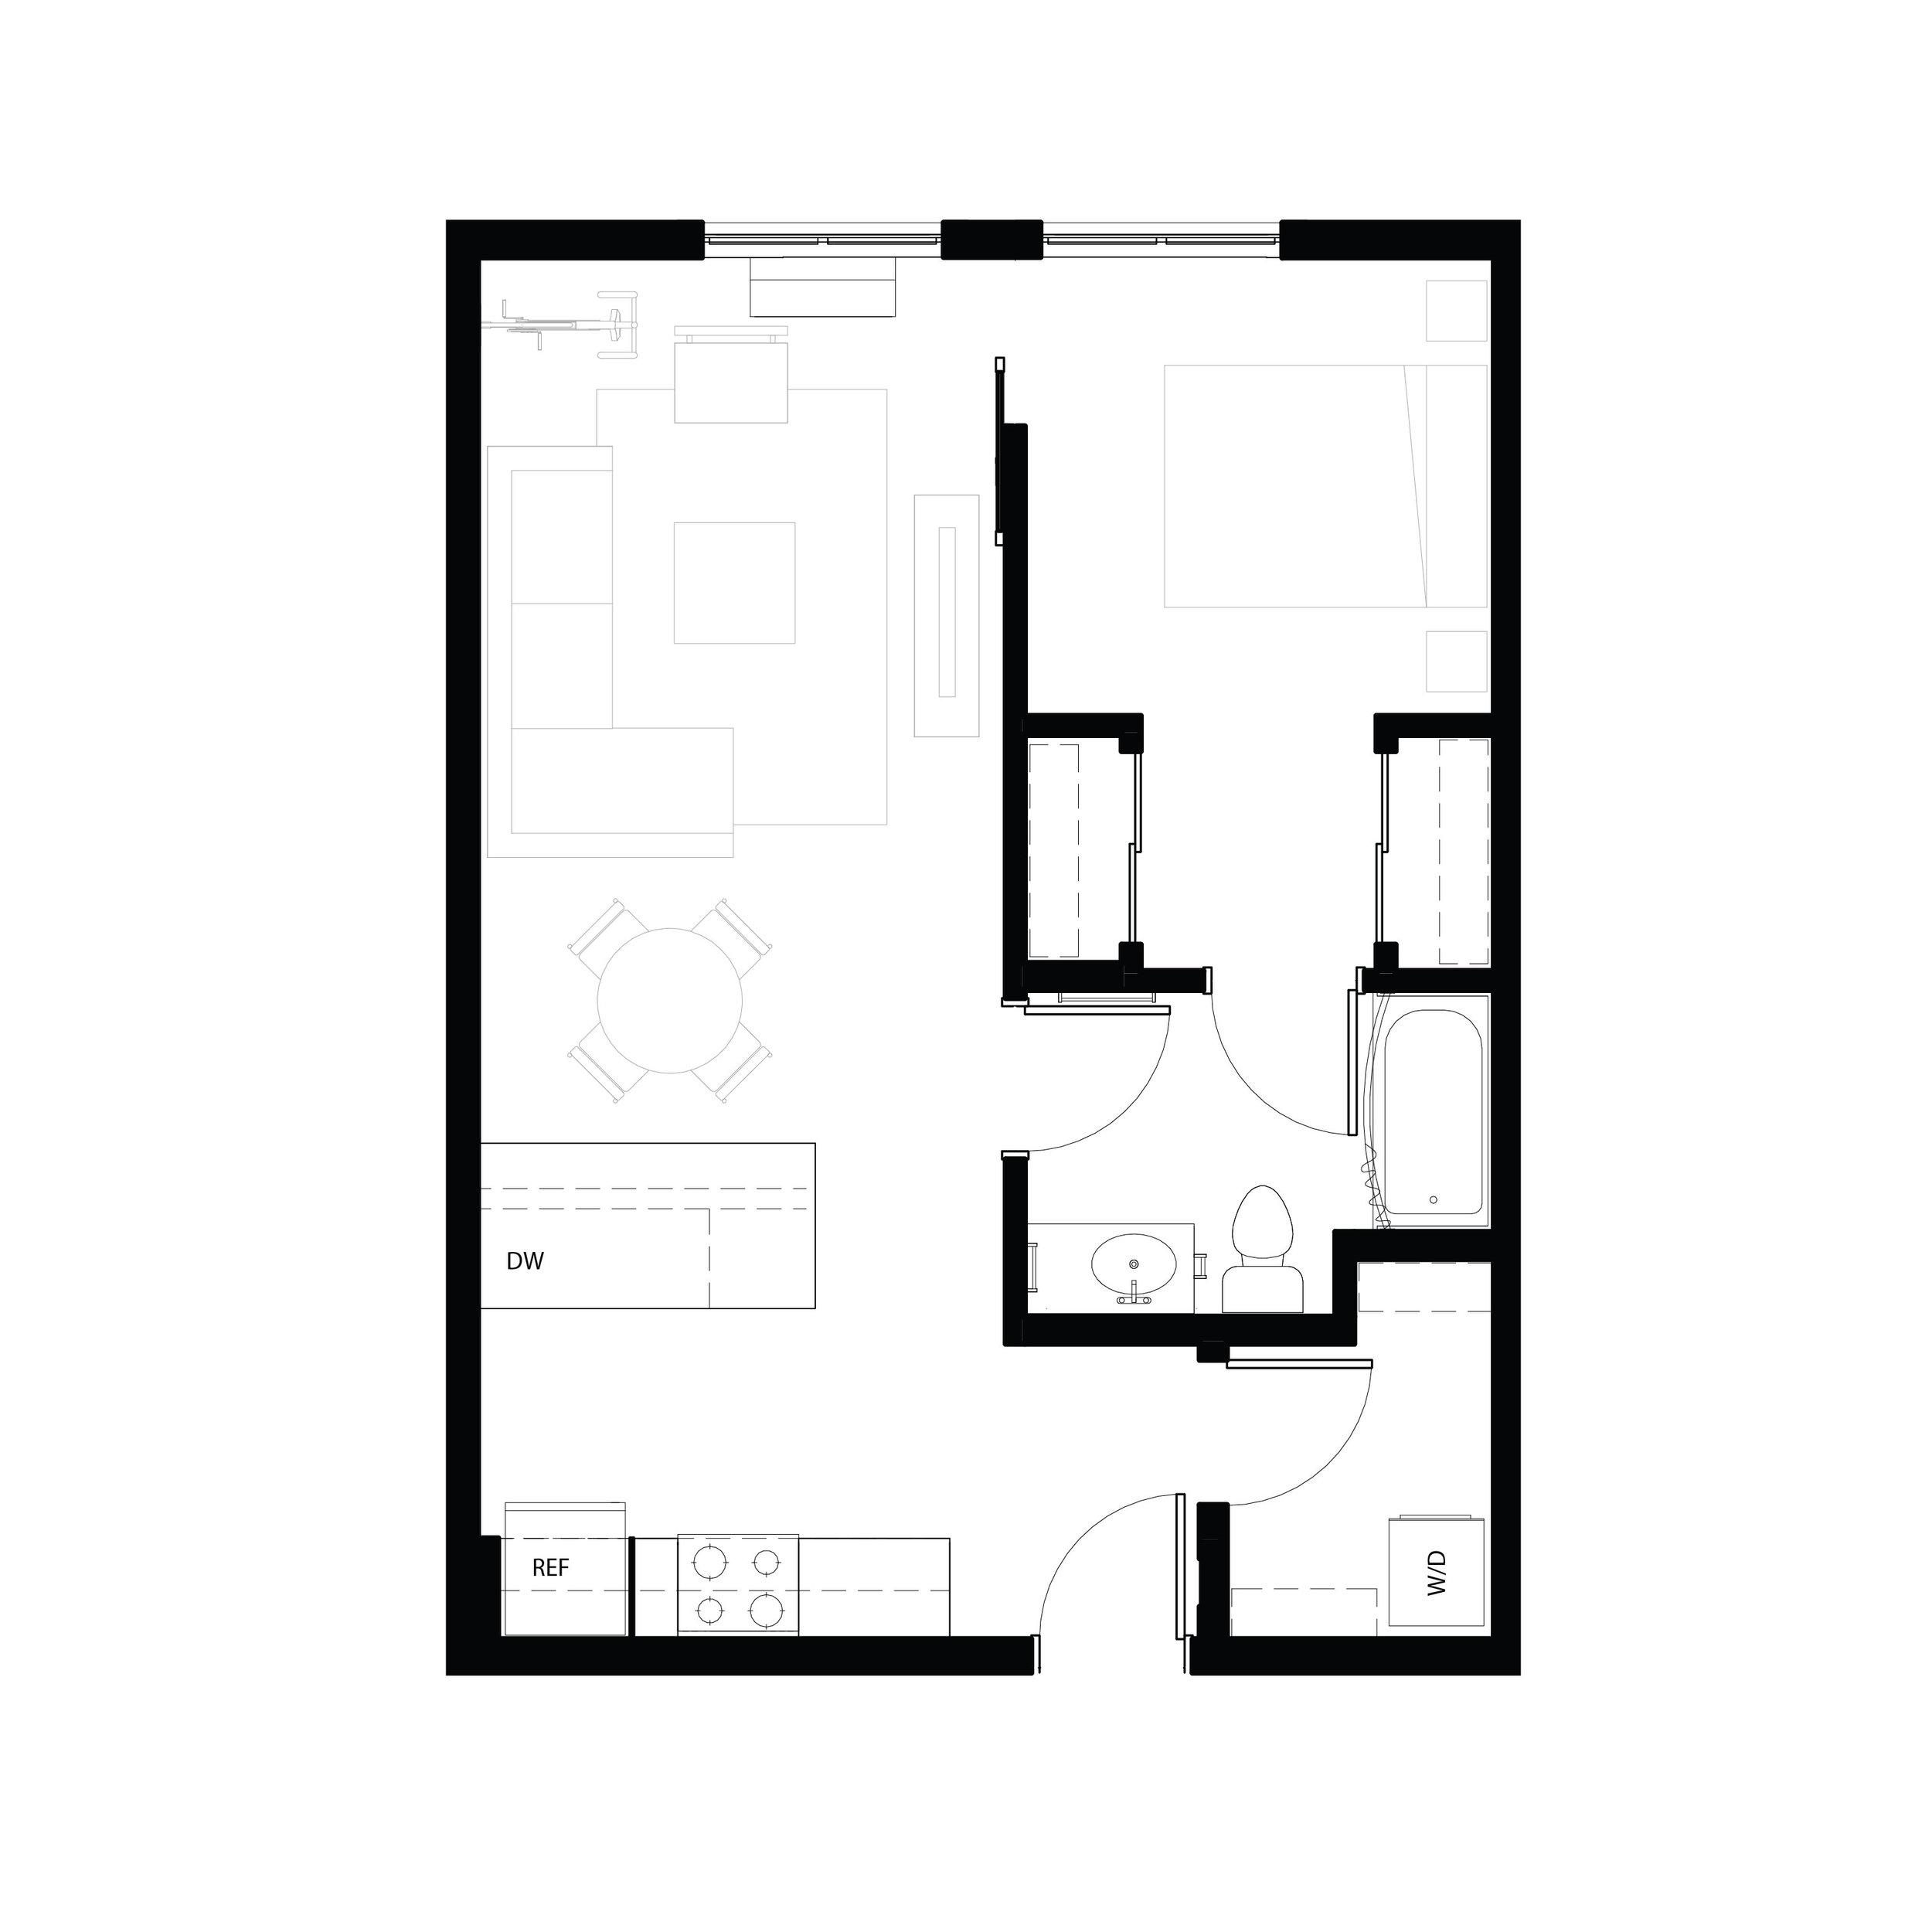 One bedroom 650 sq ft